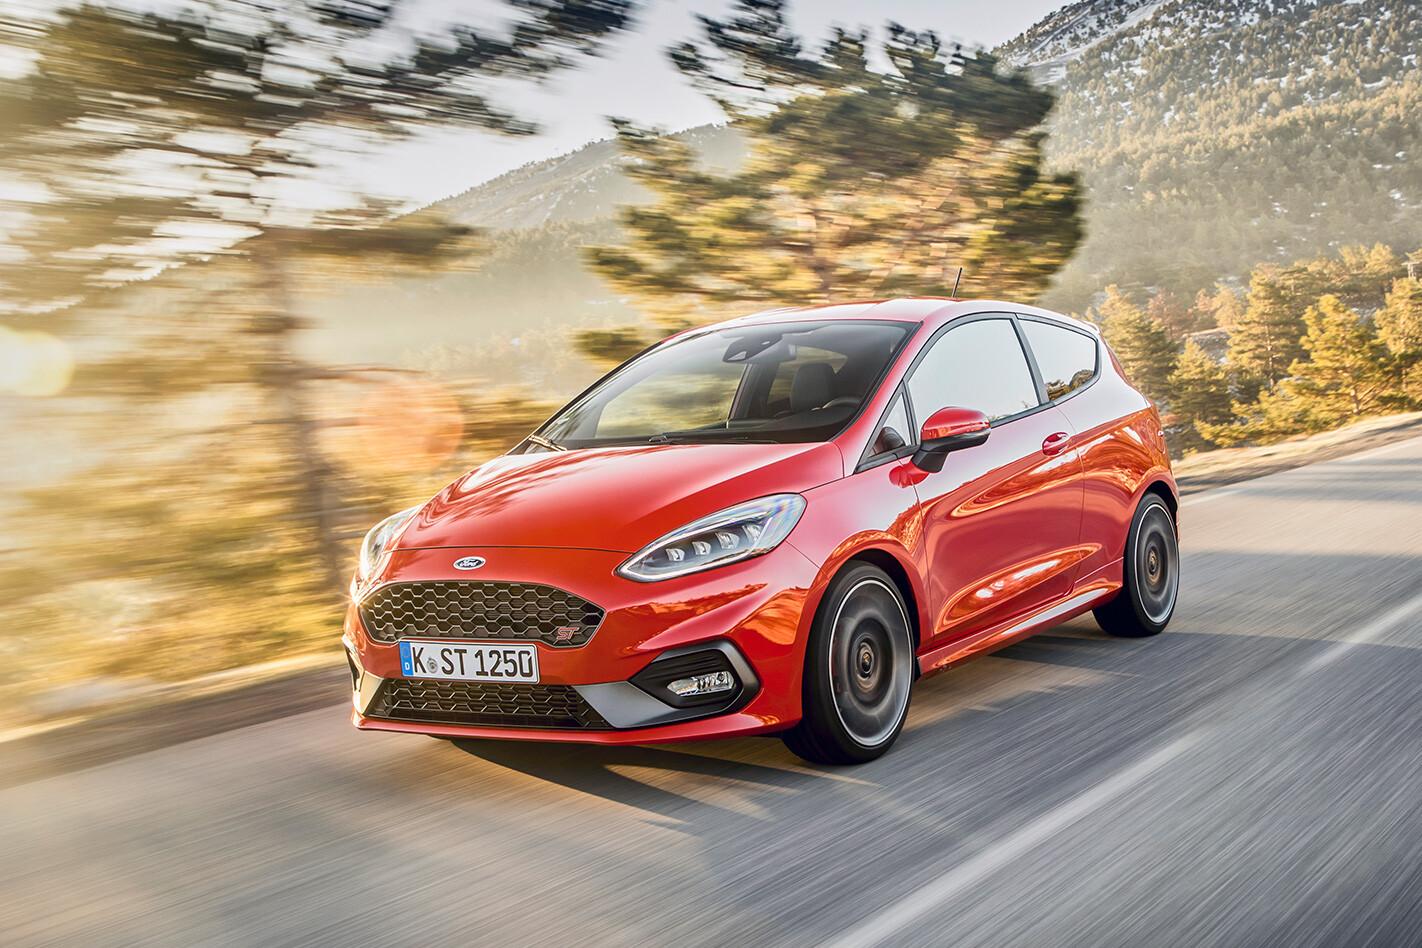 Ford Fiesta St Sunrise Jpg